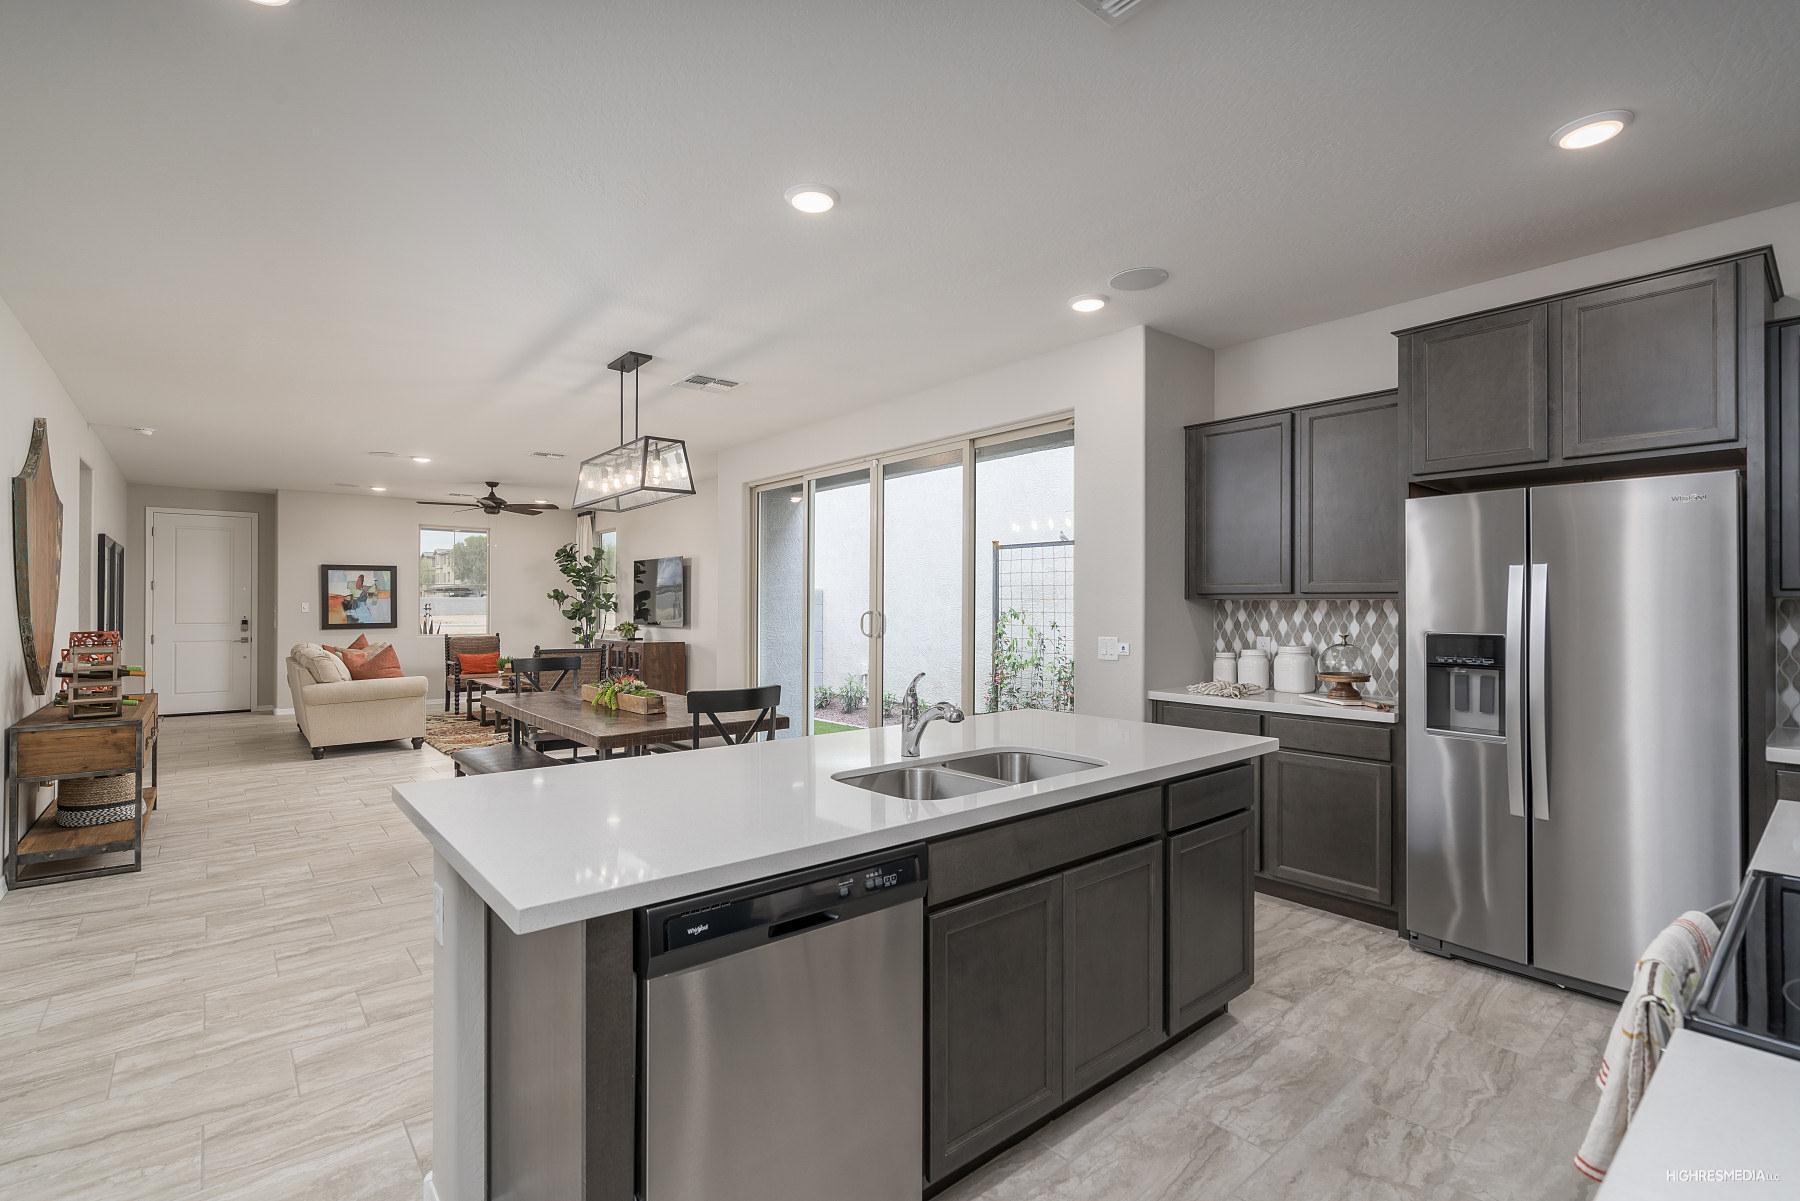 Kitchen featured in the Splendor By Landsea Homes in Phoenix-Mesa, AZ